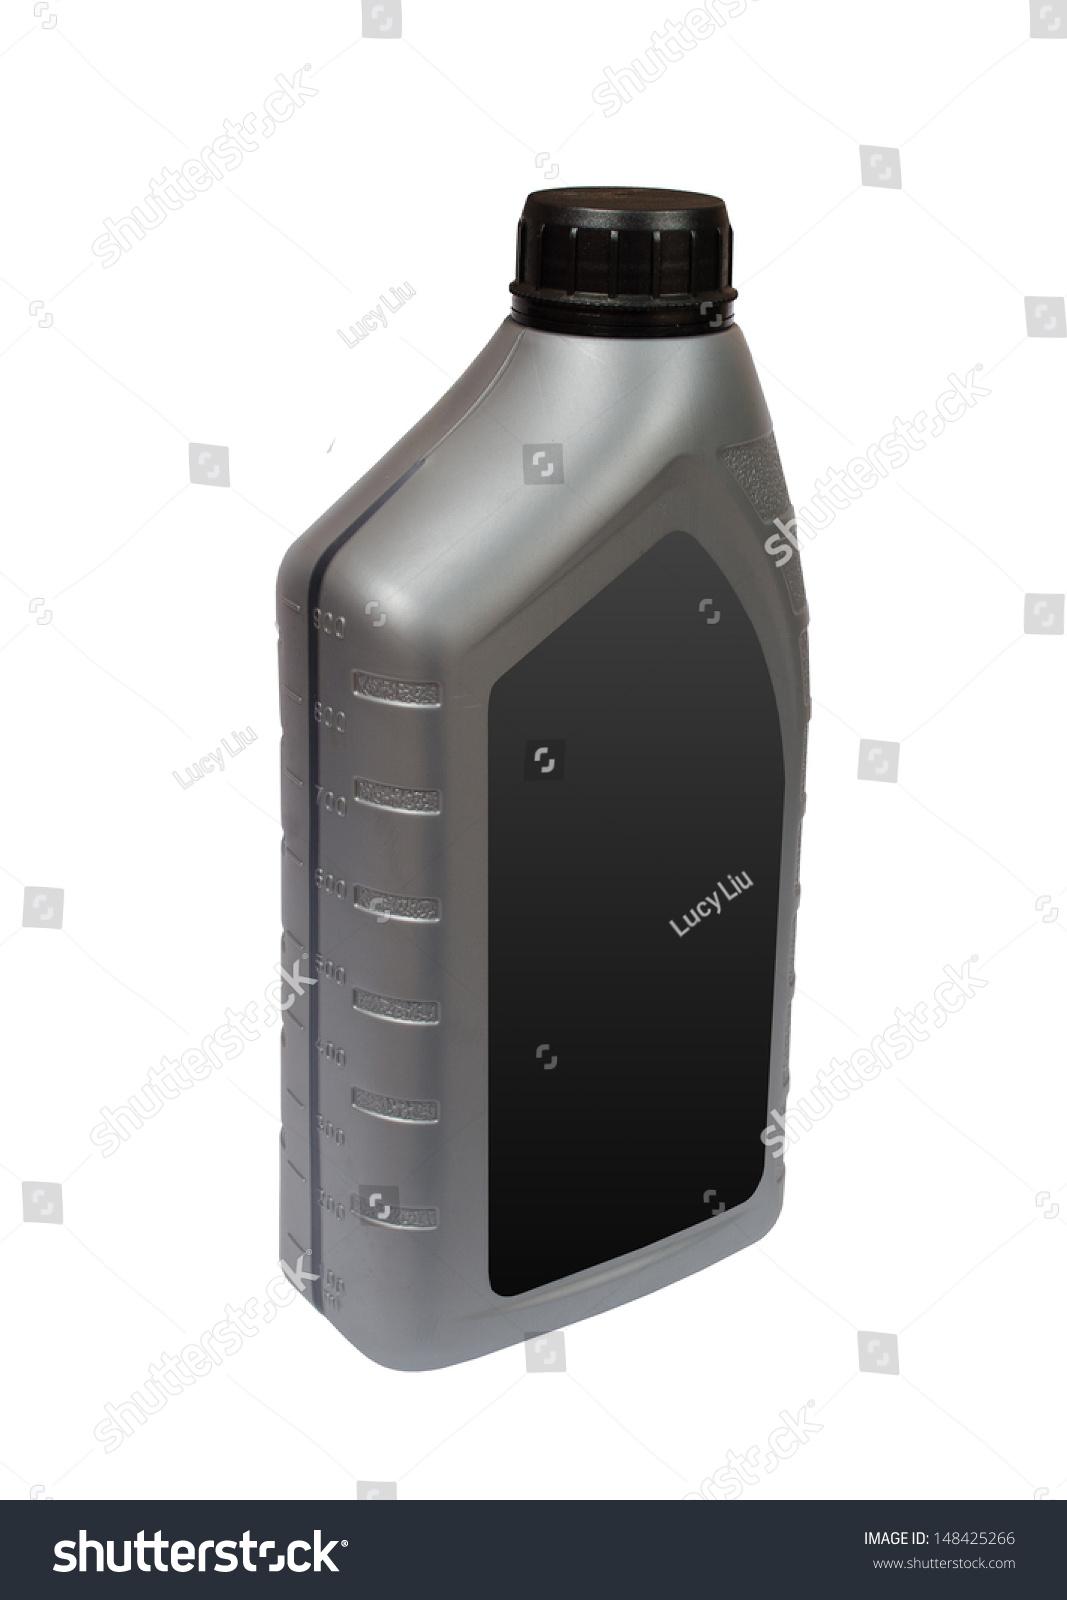 Online image photo editor shutterstock editor for Motor oil plastic bottle manufacturer